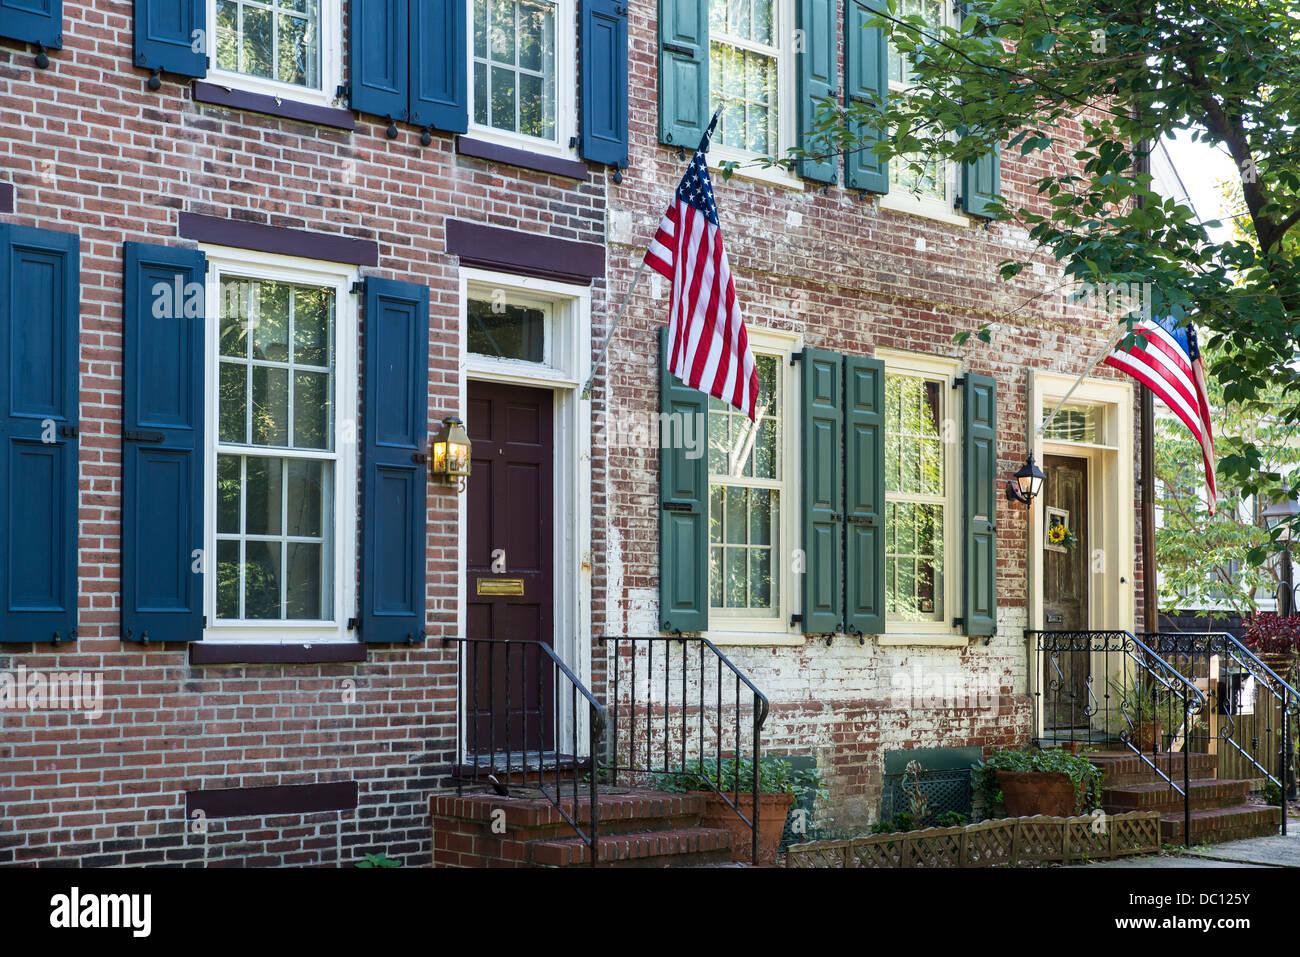 Quaint colonial house on historic Woods Street, Burlington, New Jersey, USA - Stock Image